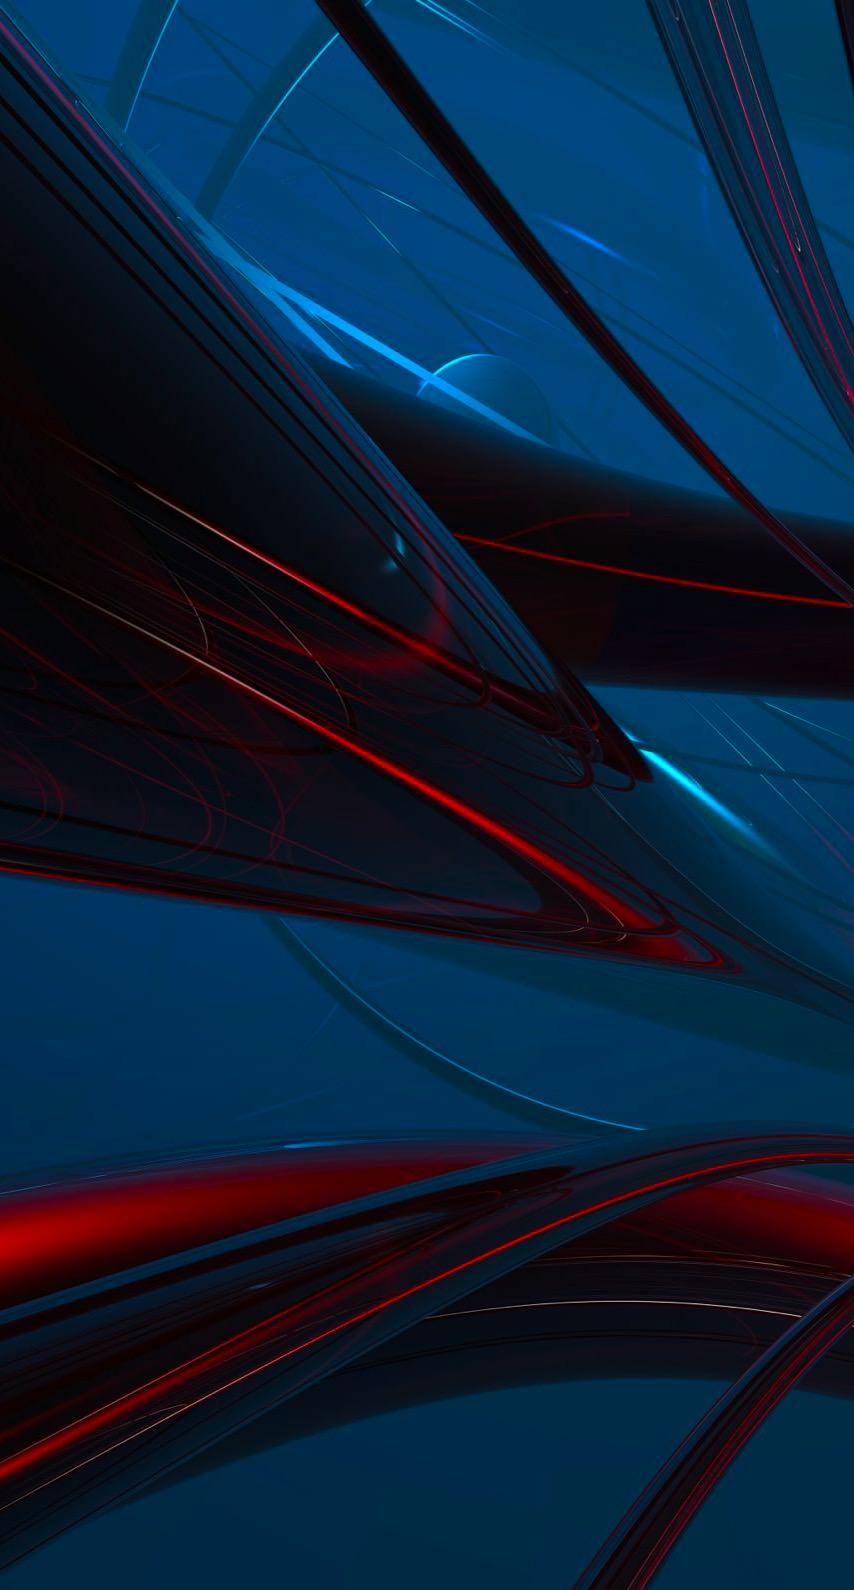 Cool blue-black pattern 3D | wallpaper.sc iPhone6s